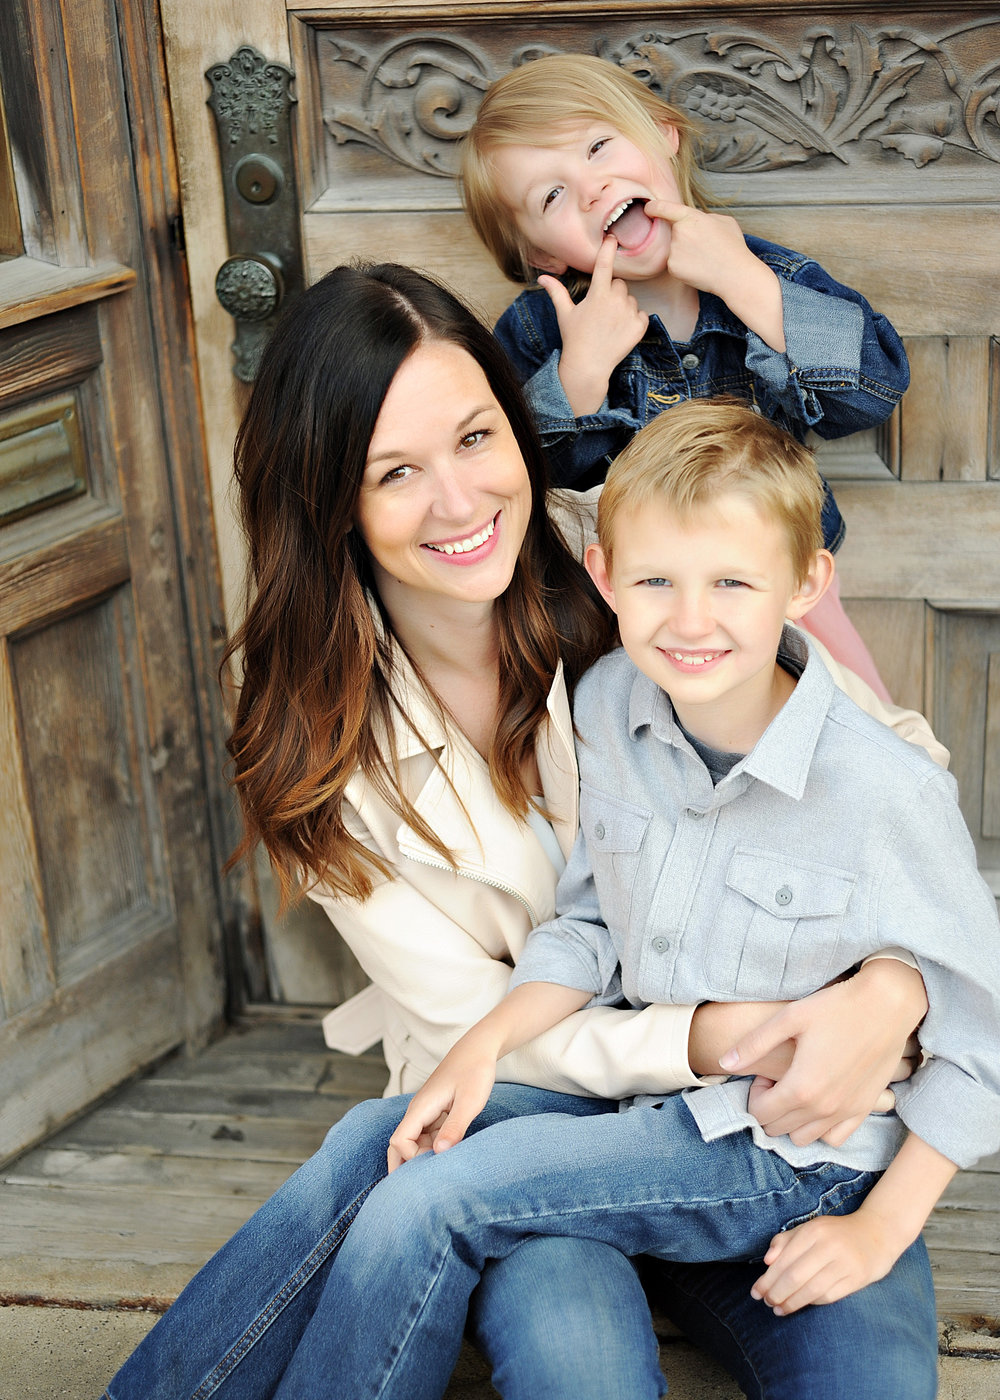 jackson+kenzie+mom_015.jpg